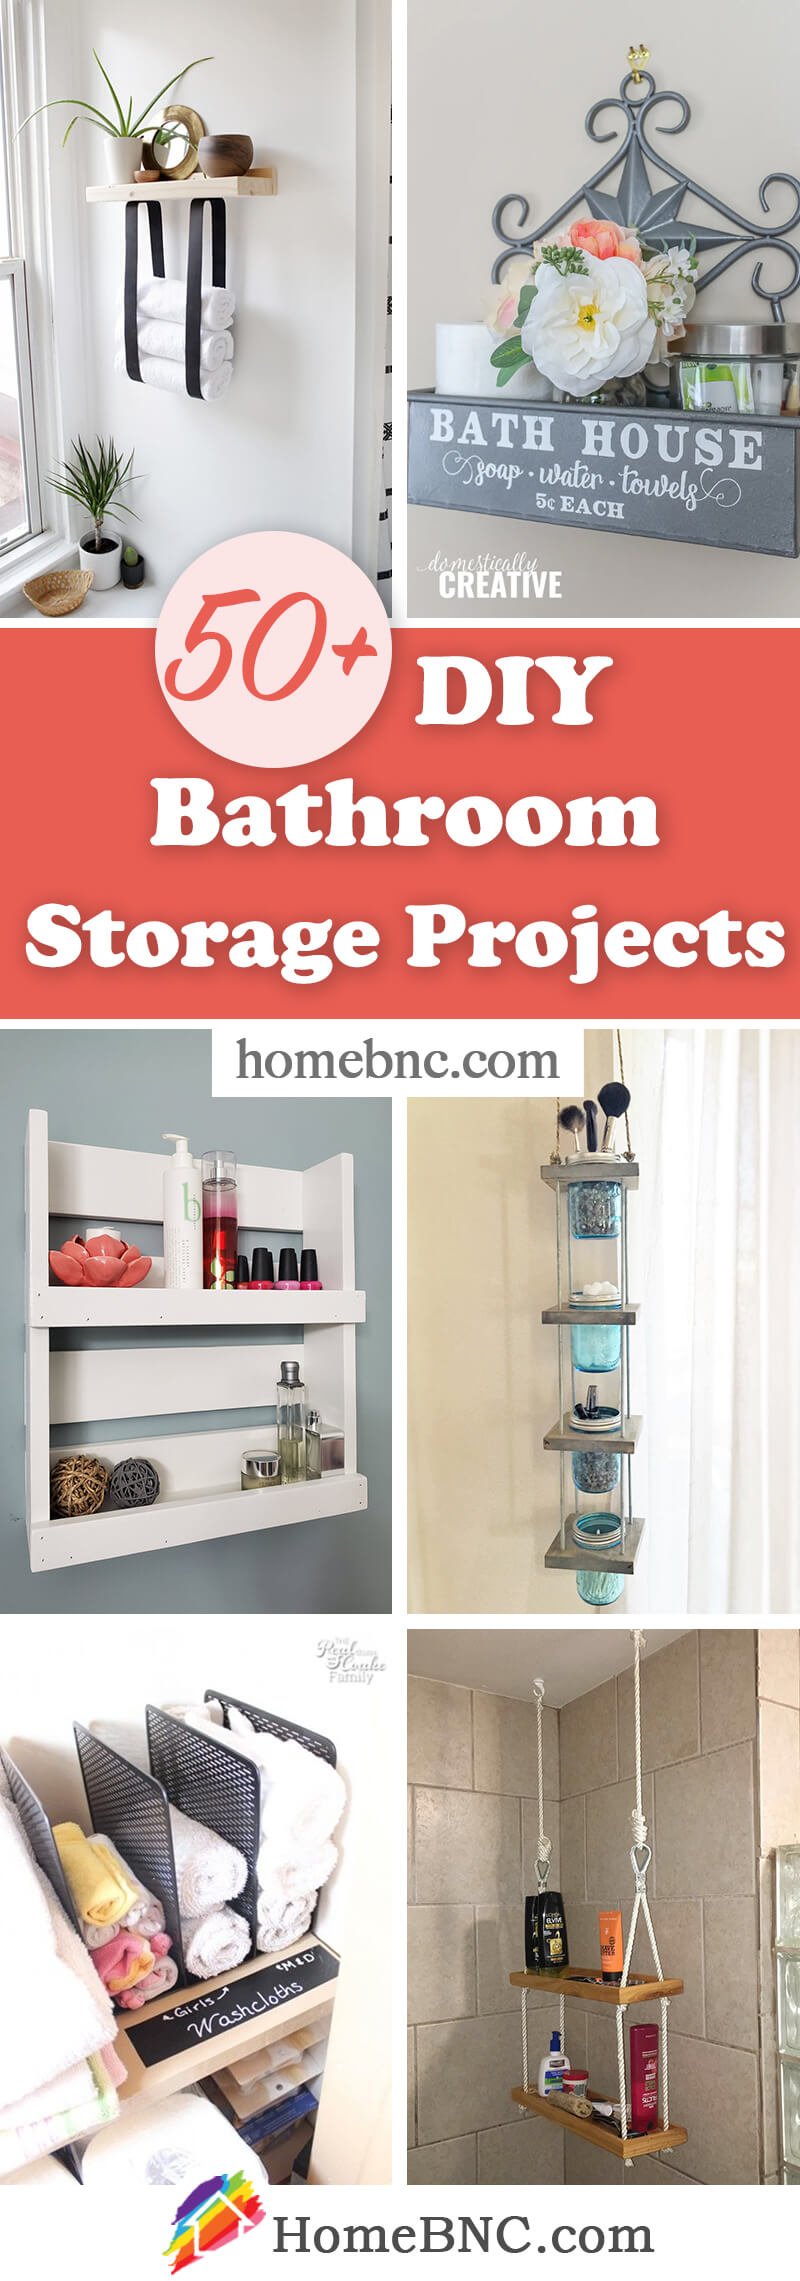 DIY Bathroom Storage Projects